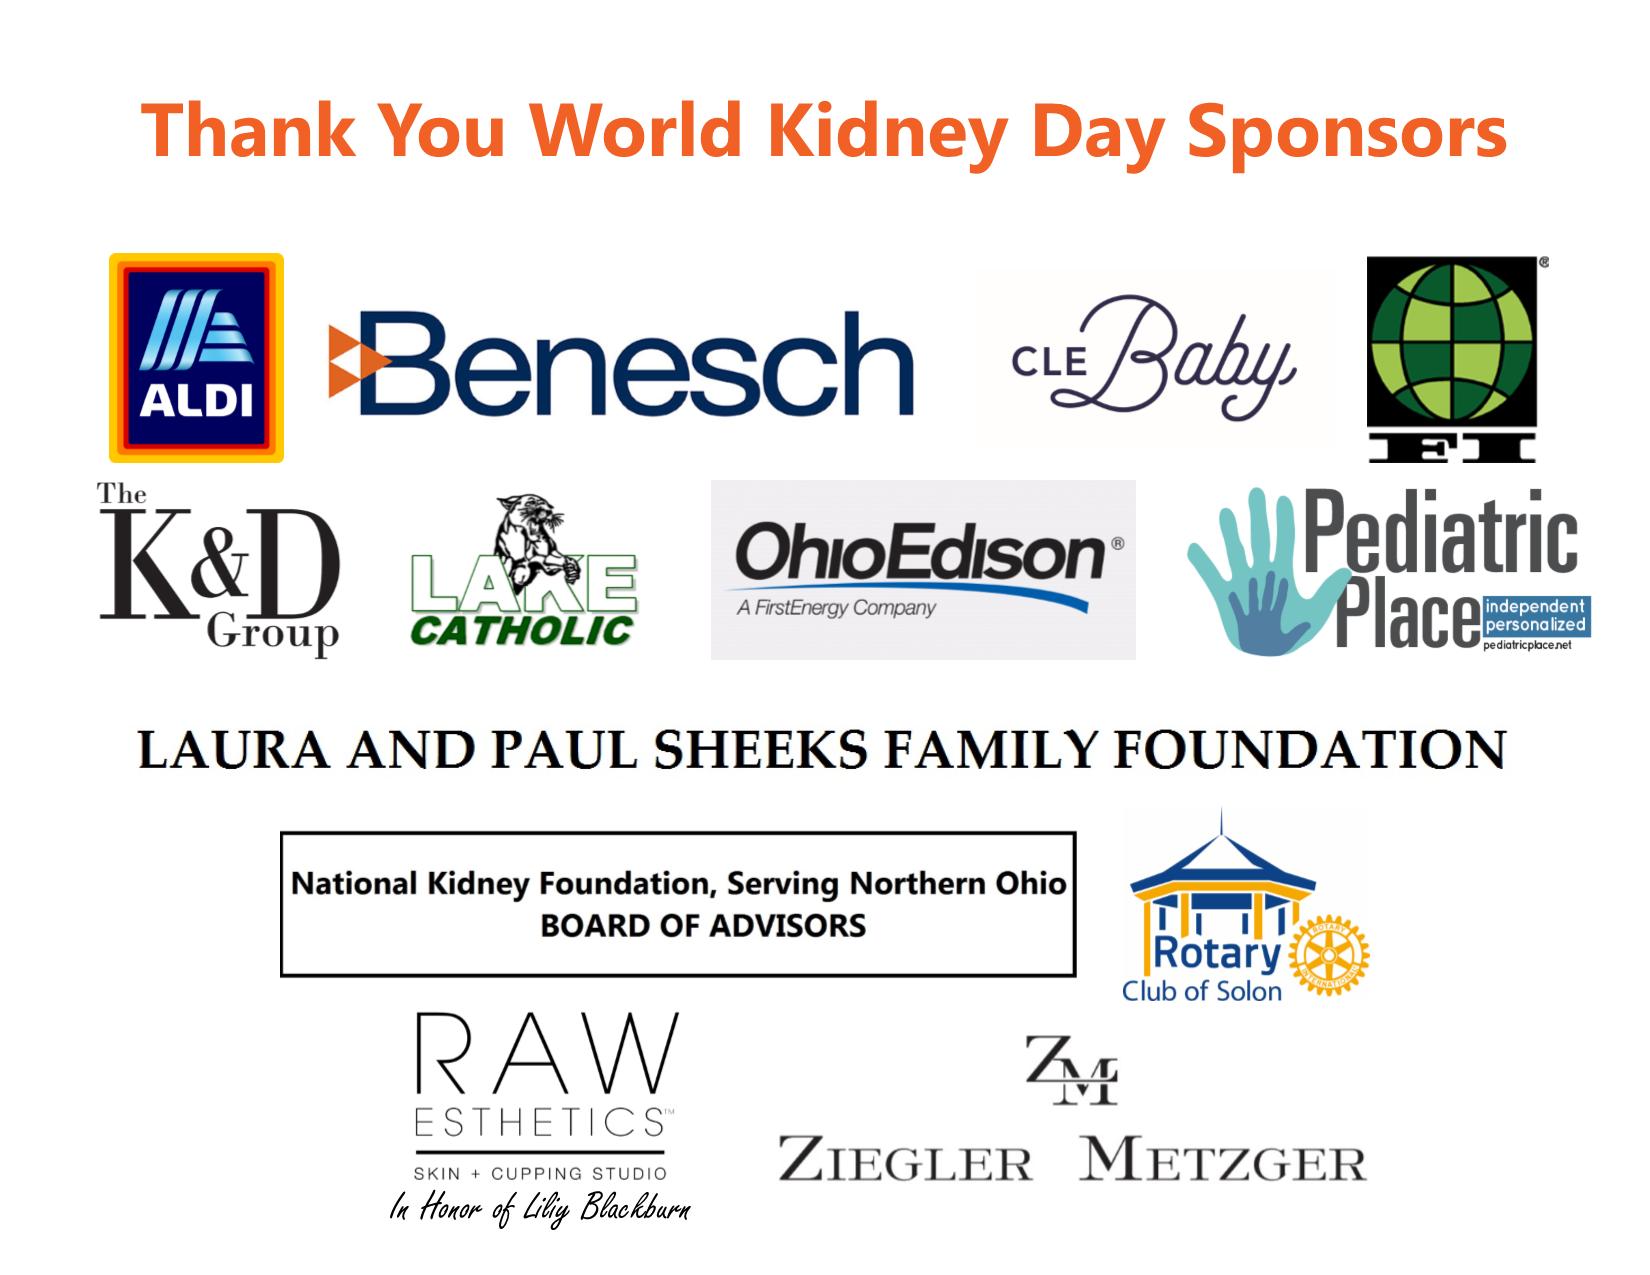 NKF Serving Northern Ohio World Kidney Day Sponsors